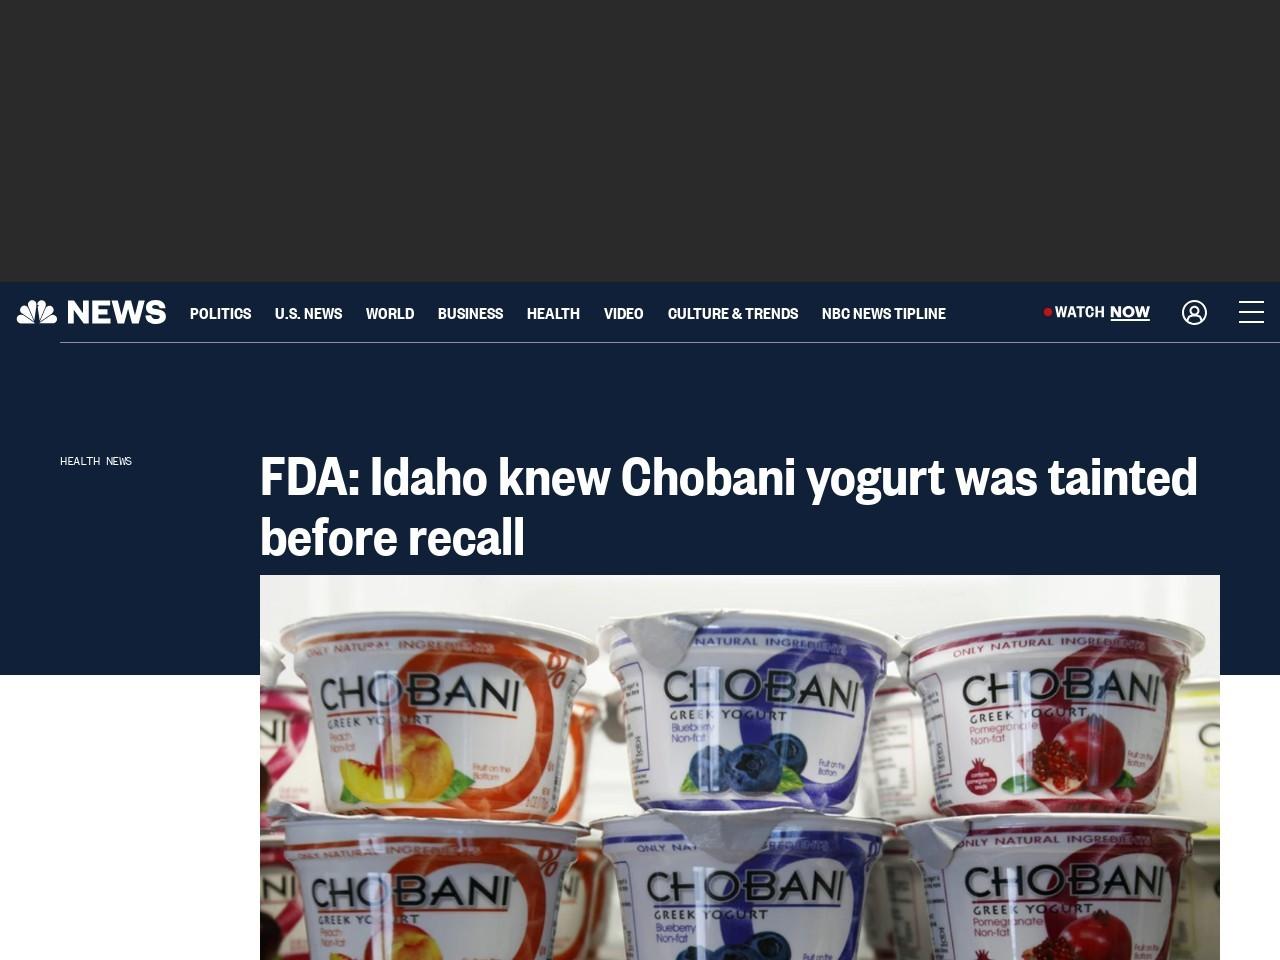 FDA: Idaho knew Chobani yogurt was tainted before recall